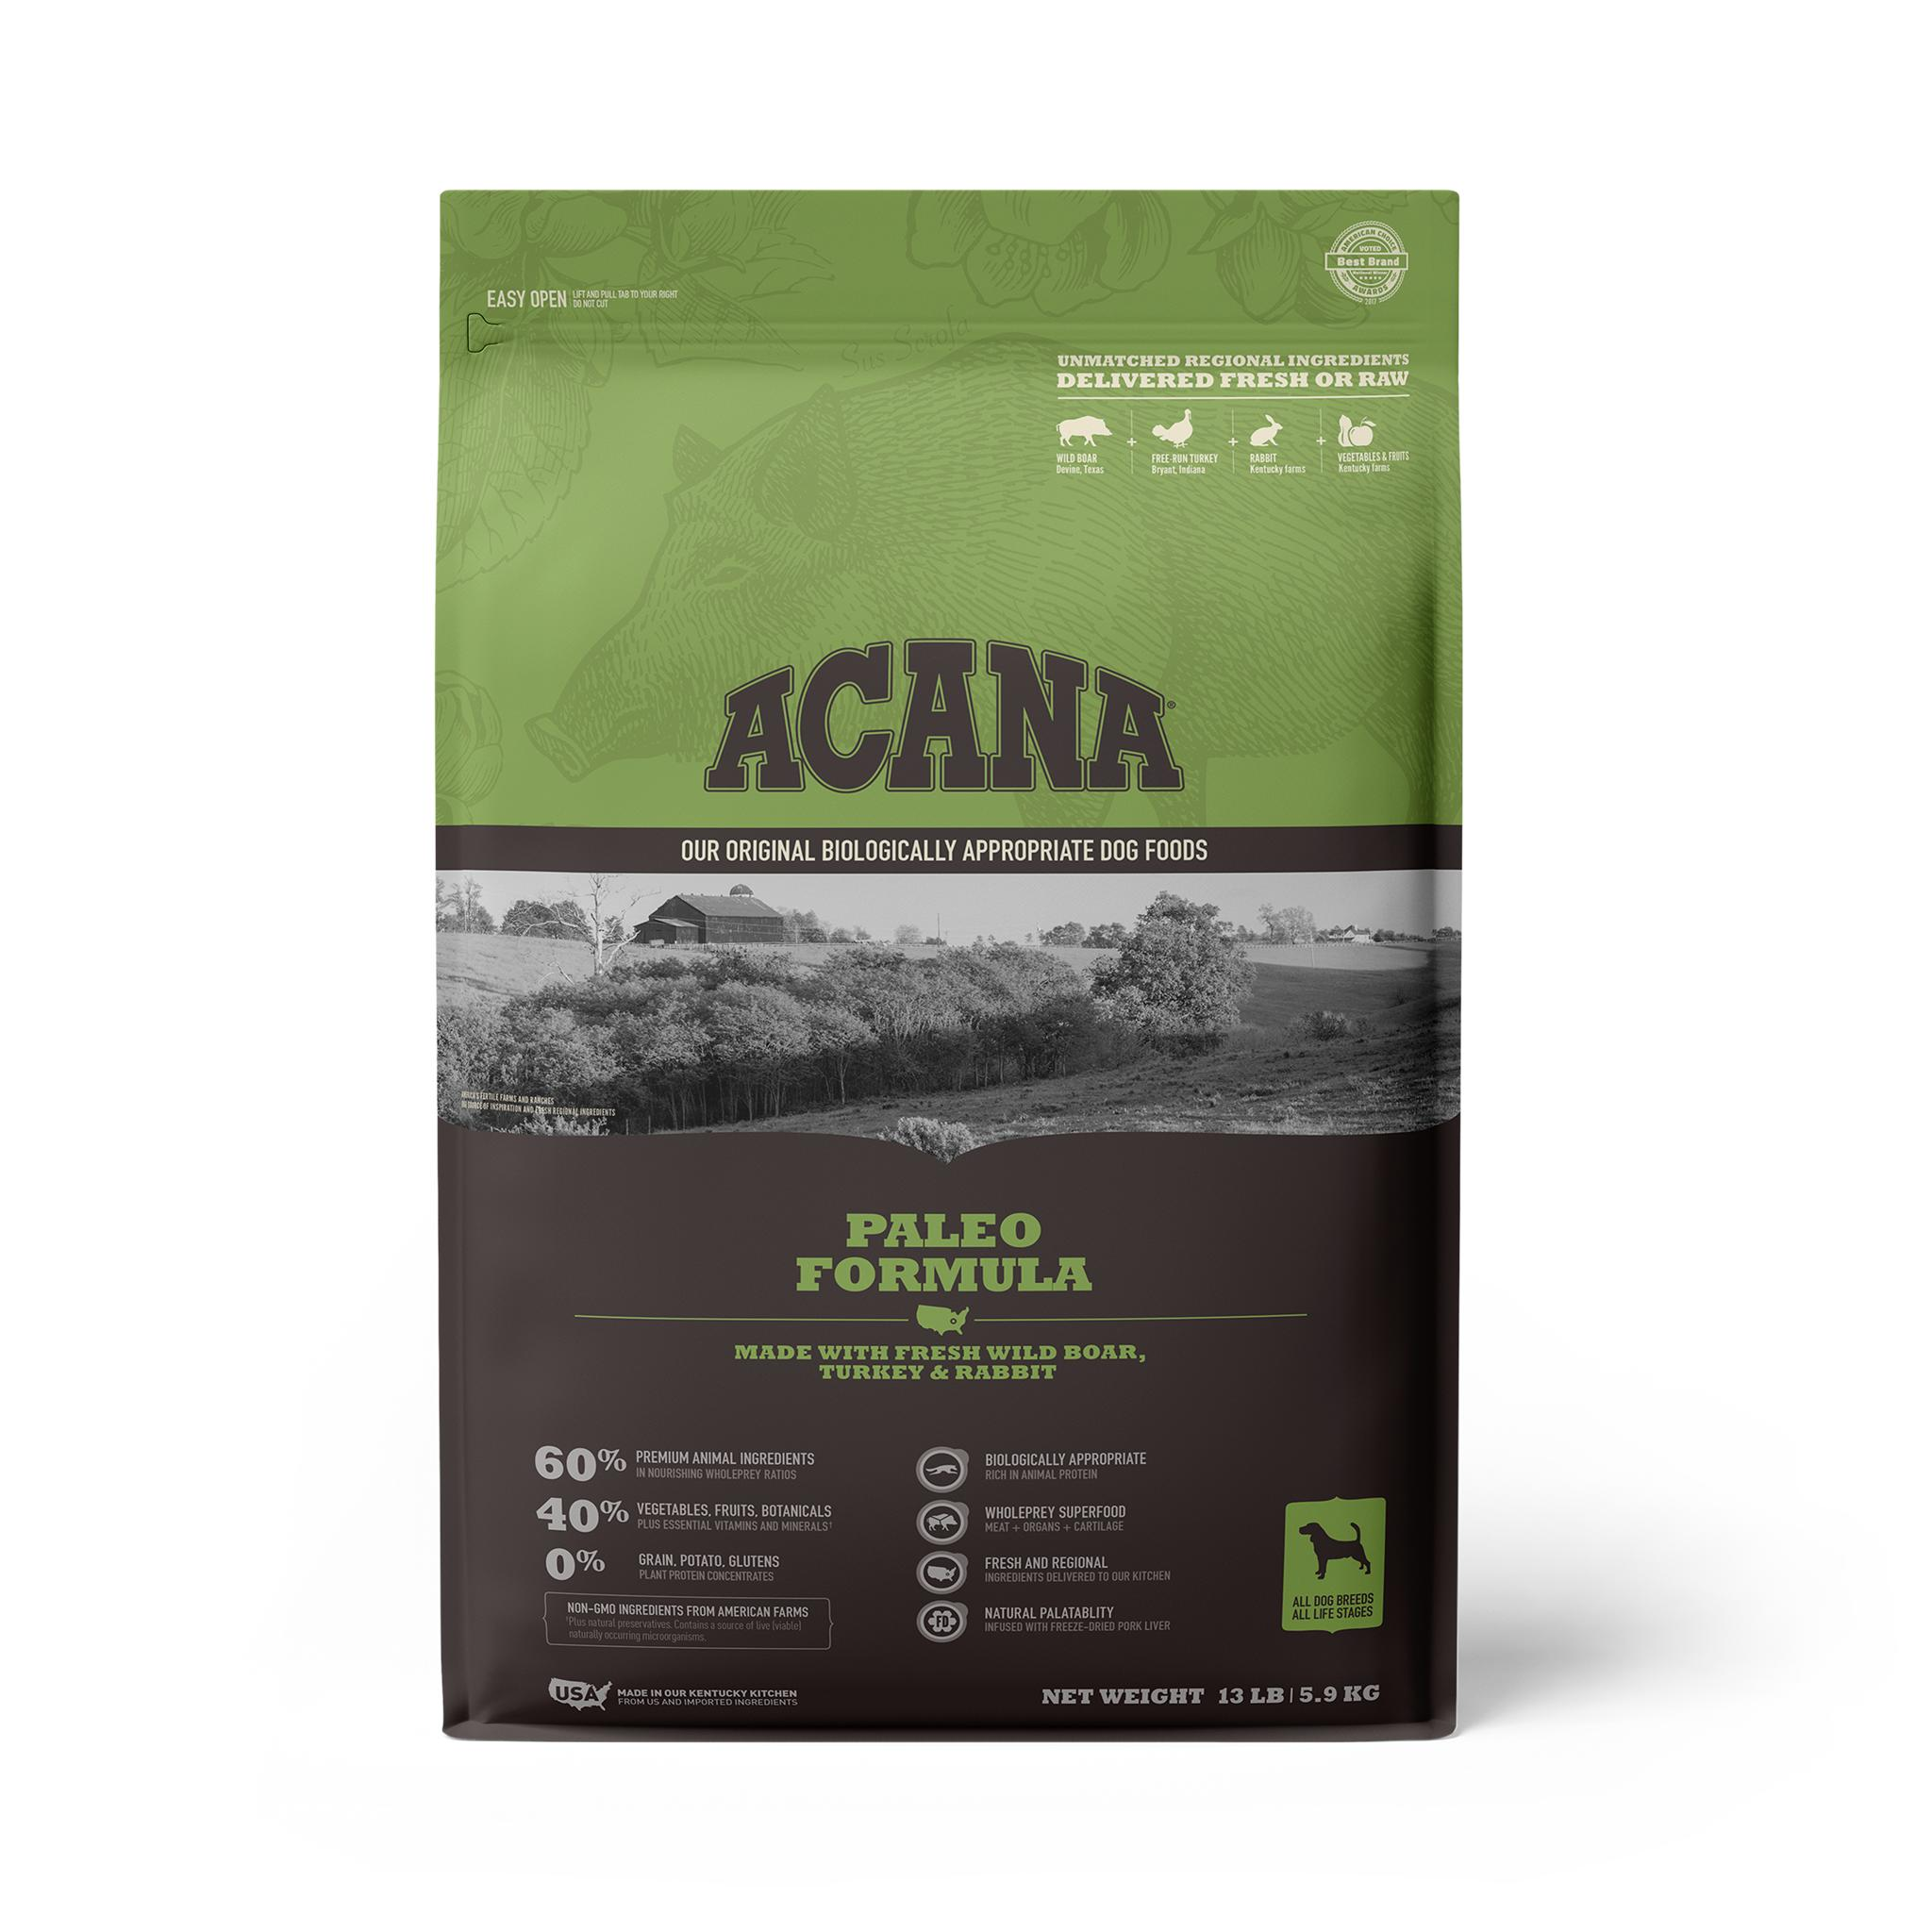 ACANA Paleo Grain-Free Dry Dog Food, 13-lb